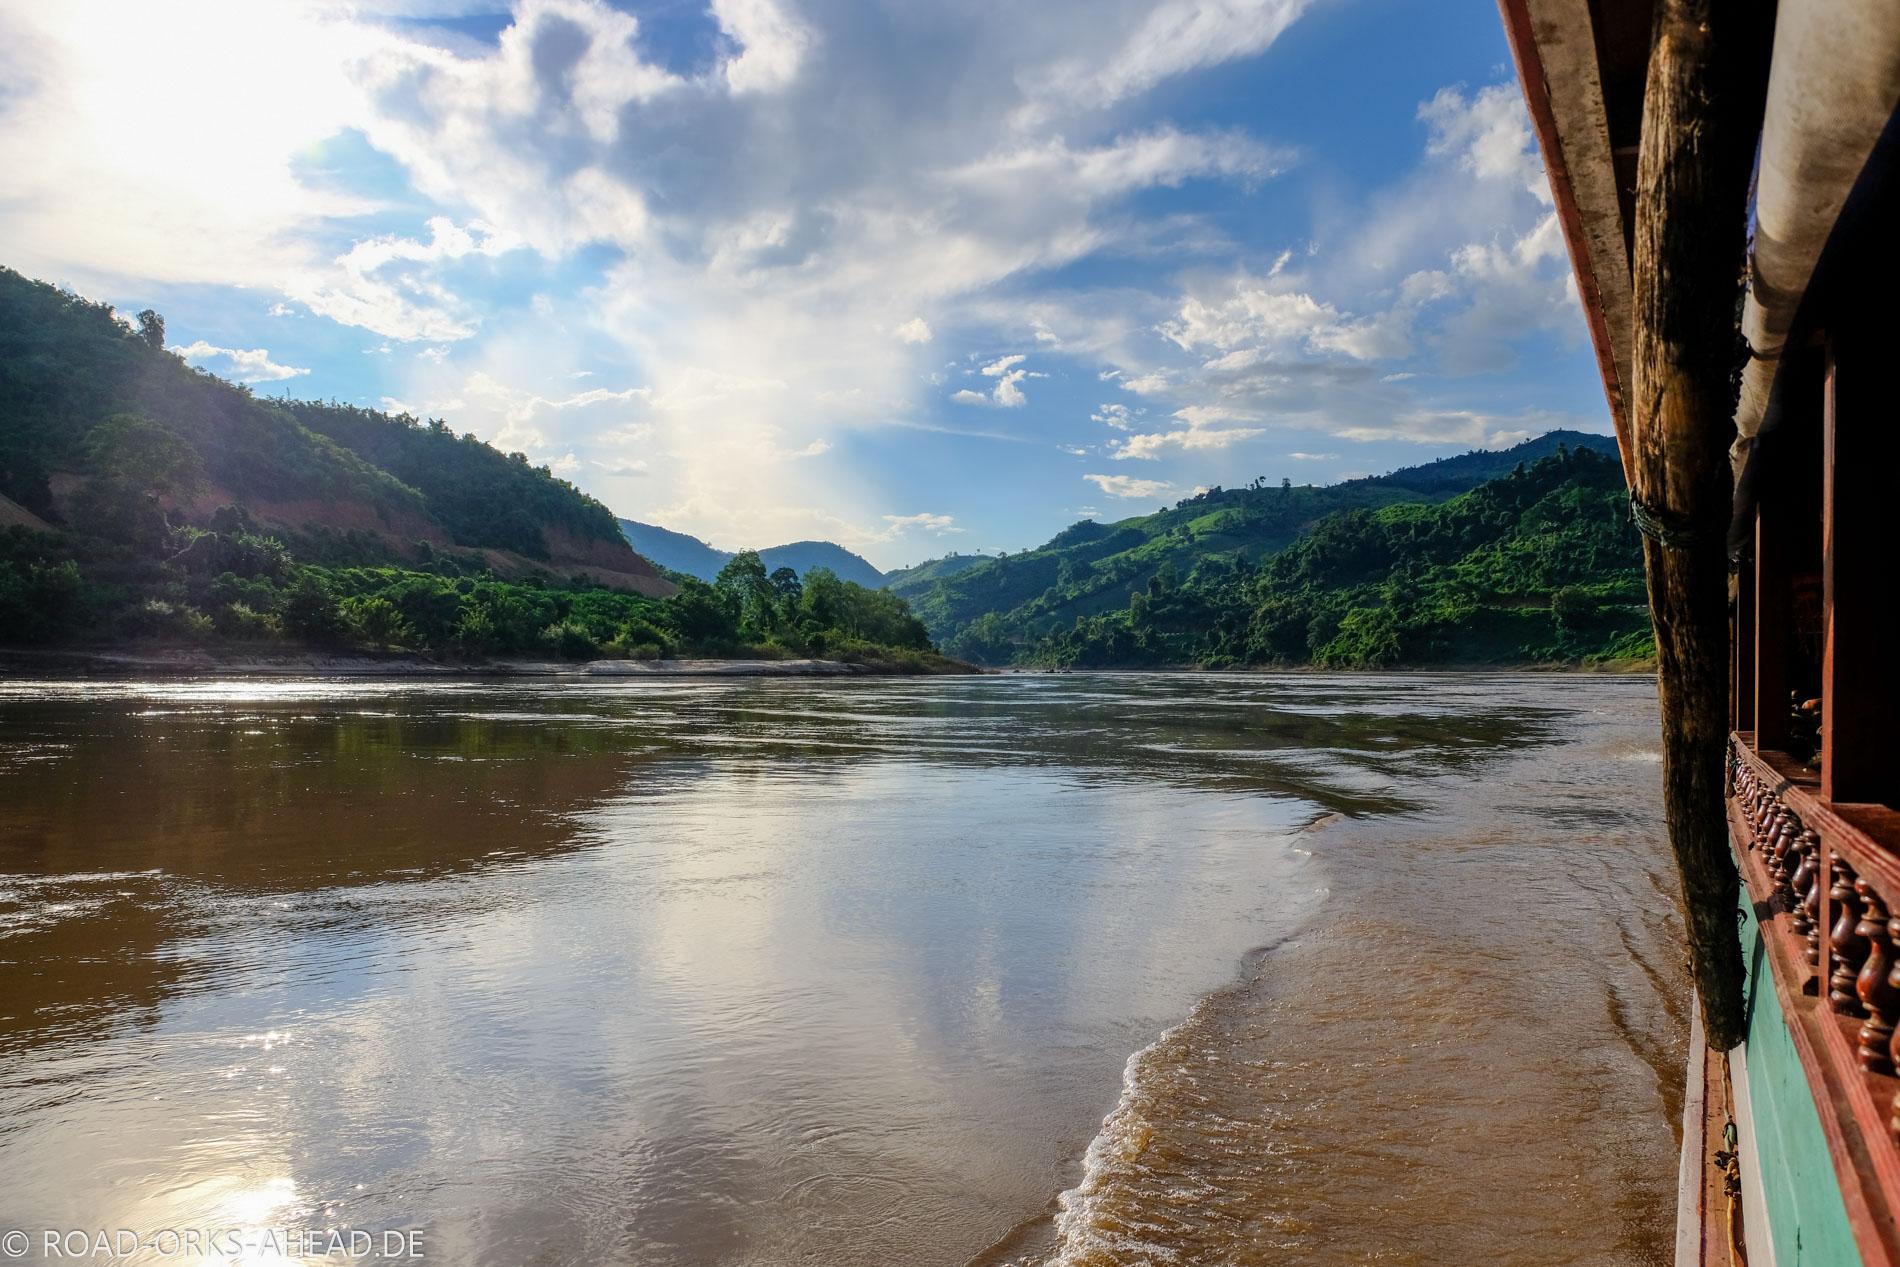 Mekong in Laos